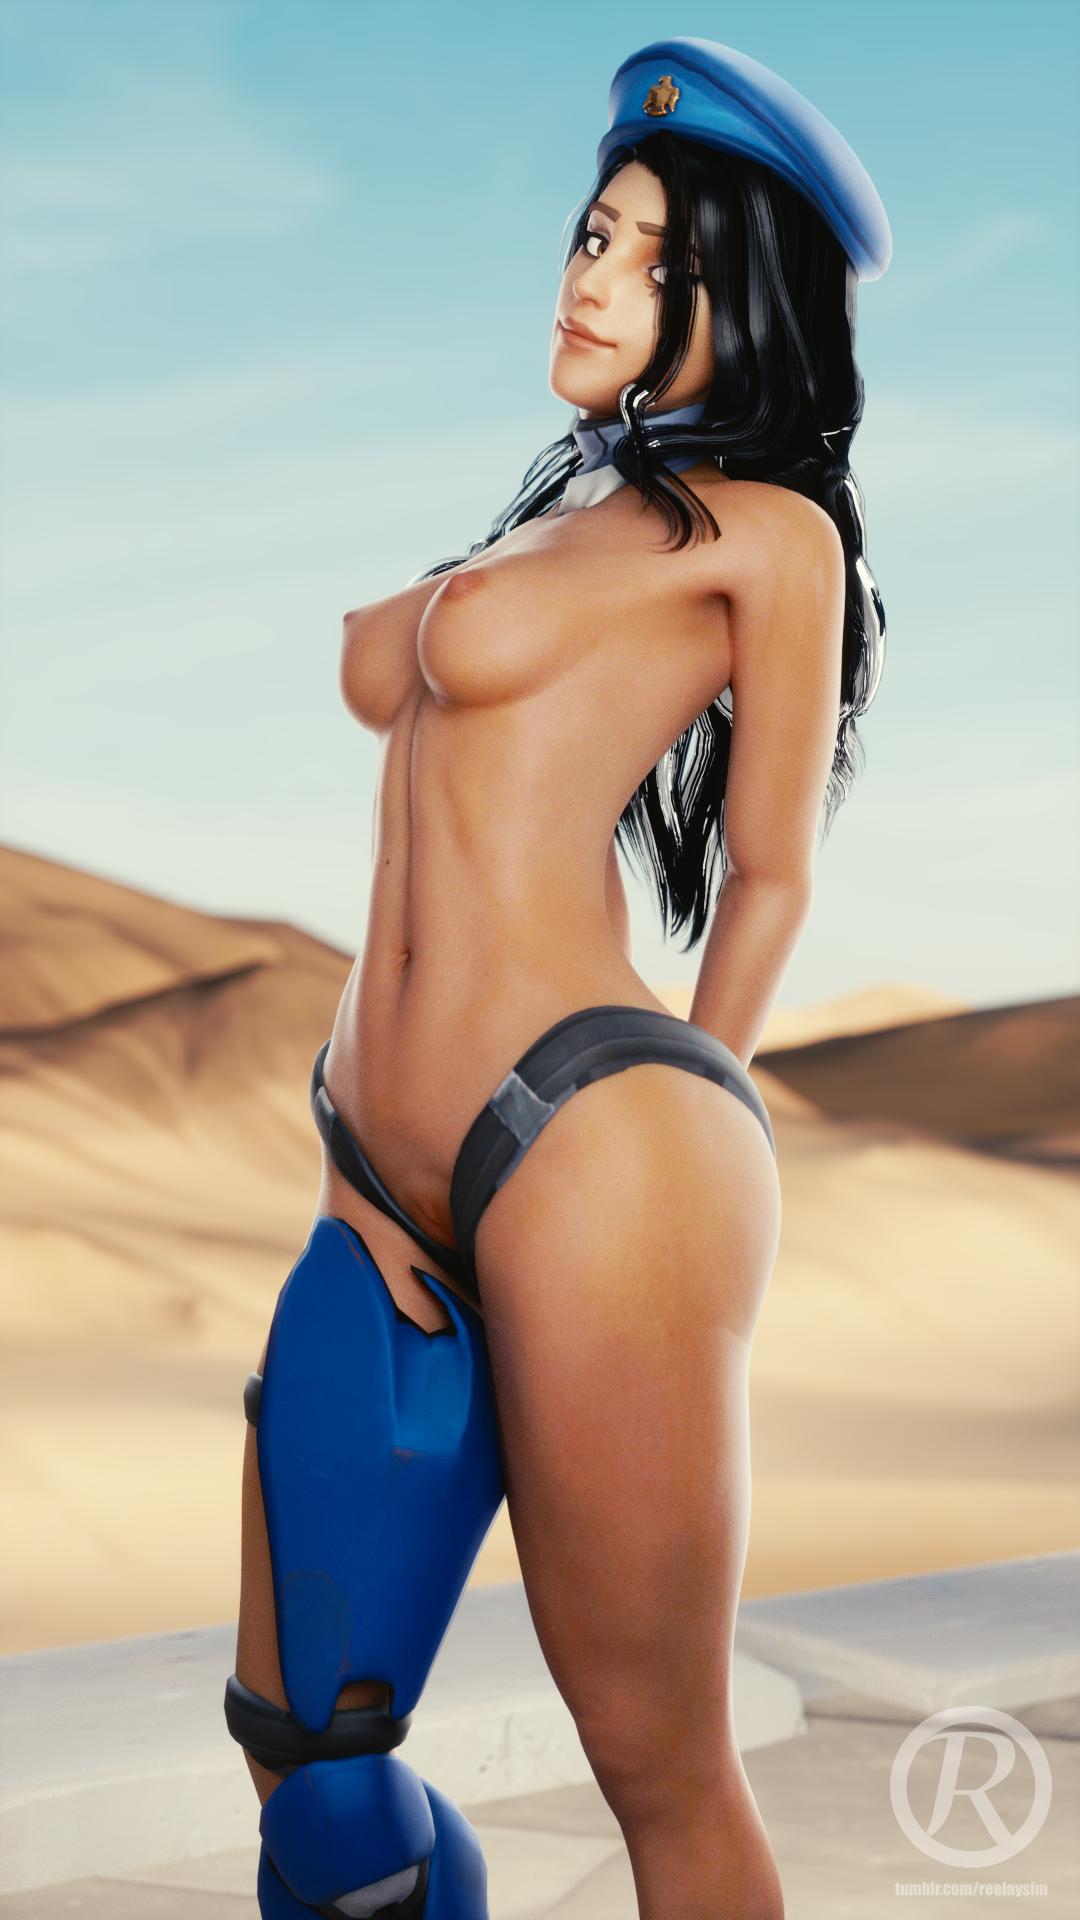 2659157 - Ana_Amari Overlook blender reelay